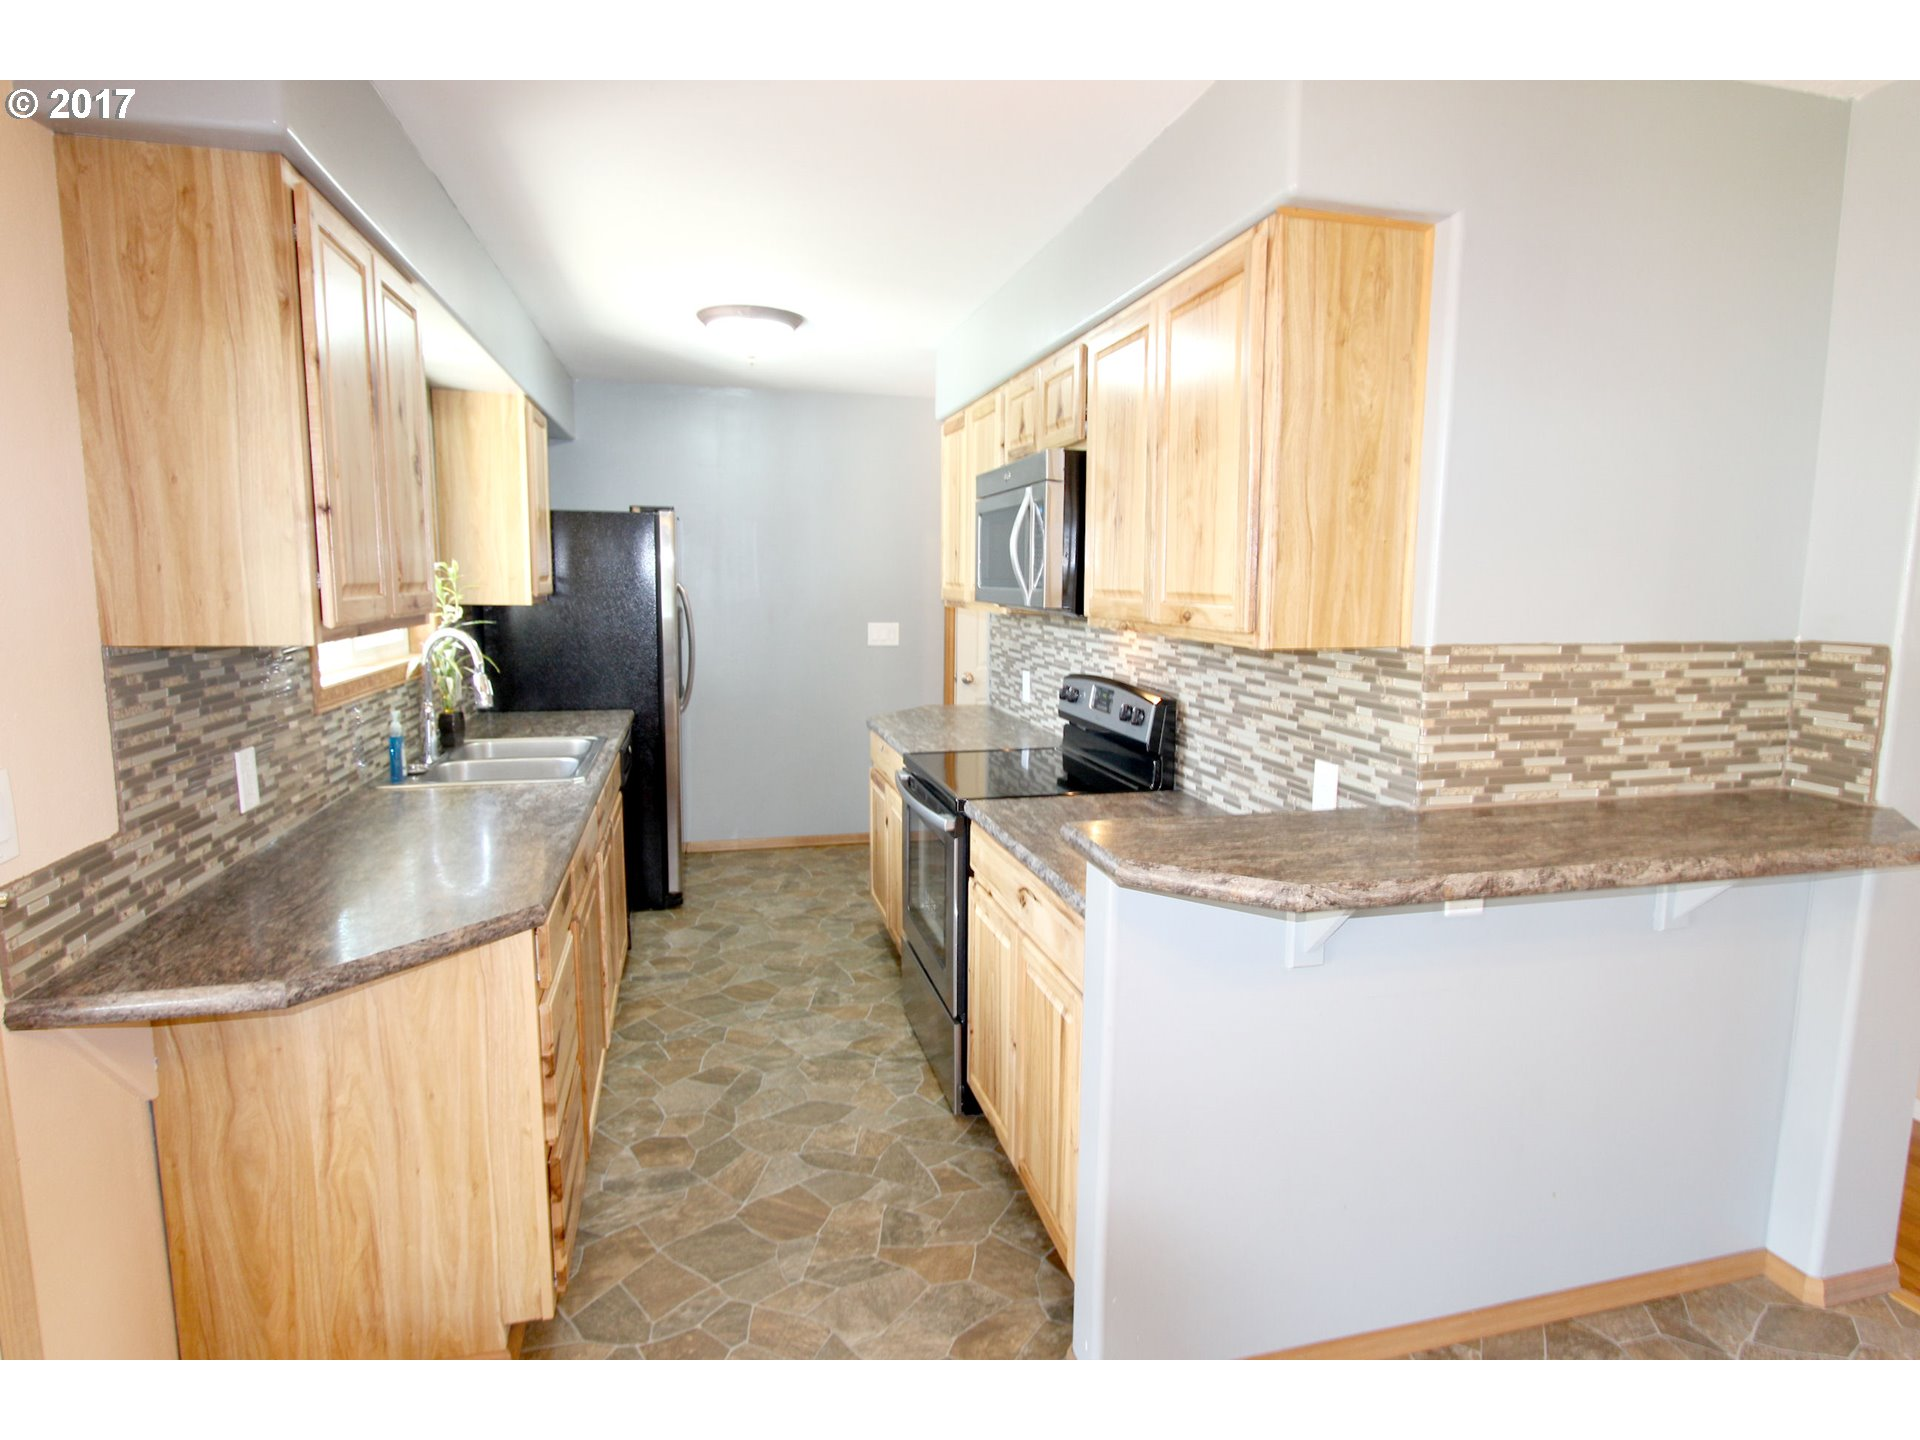 4010 LIEDTKE WAY Washougal, WA 98671 - MLS #: 17670332